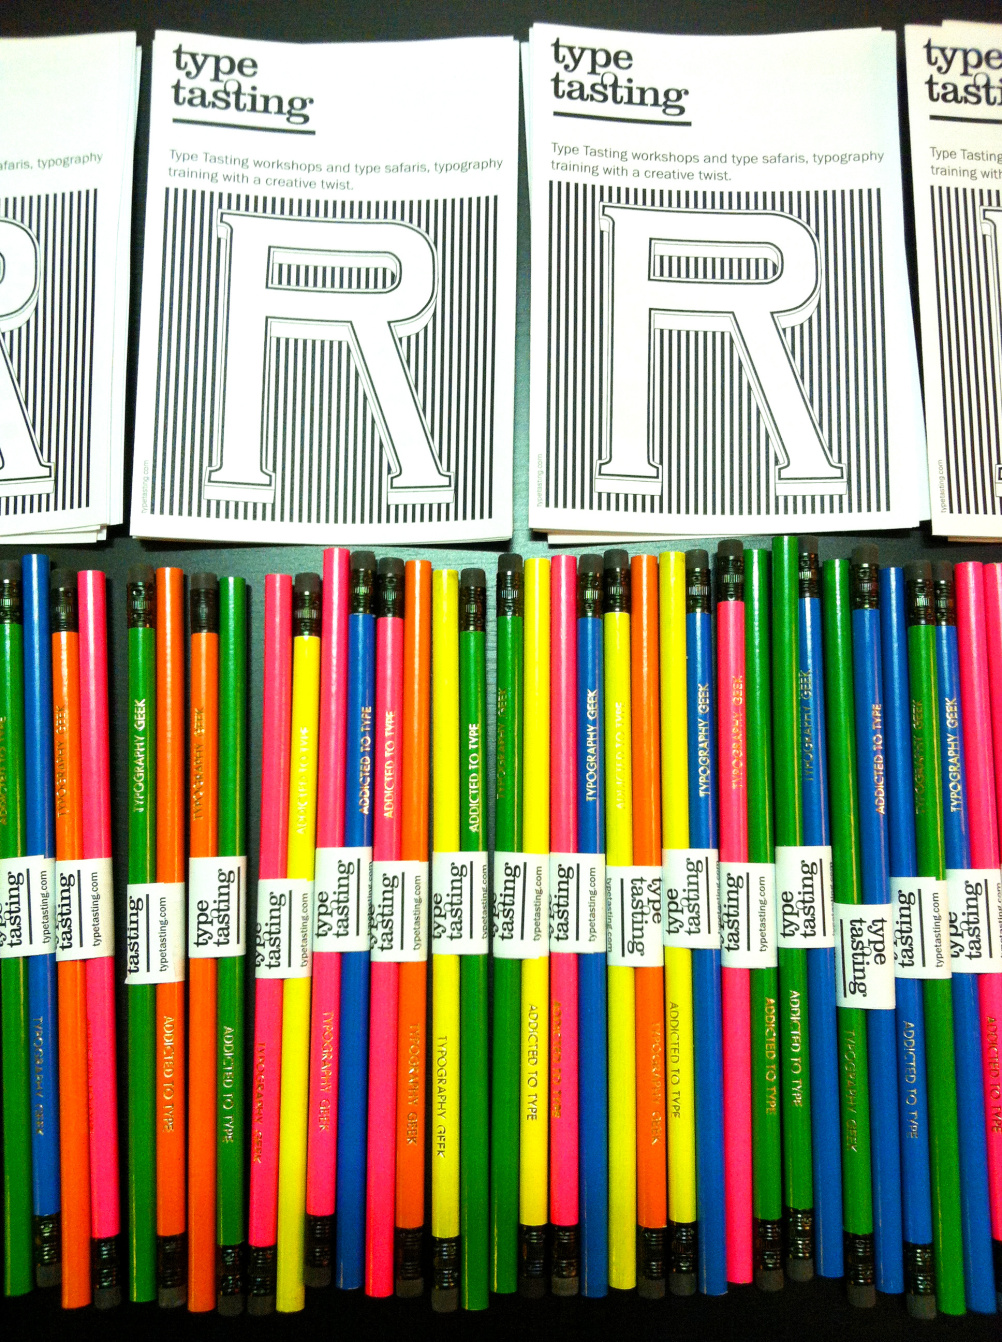 Type Tasting pencils